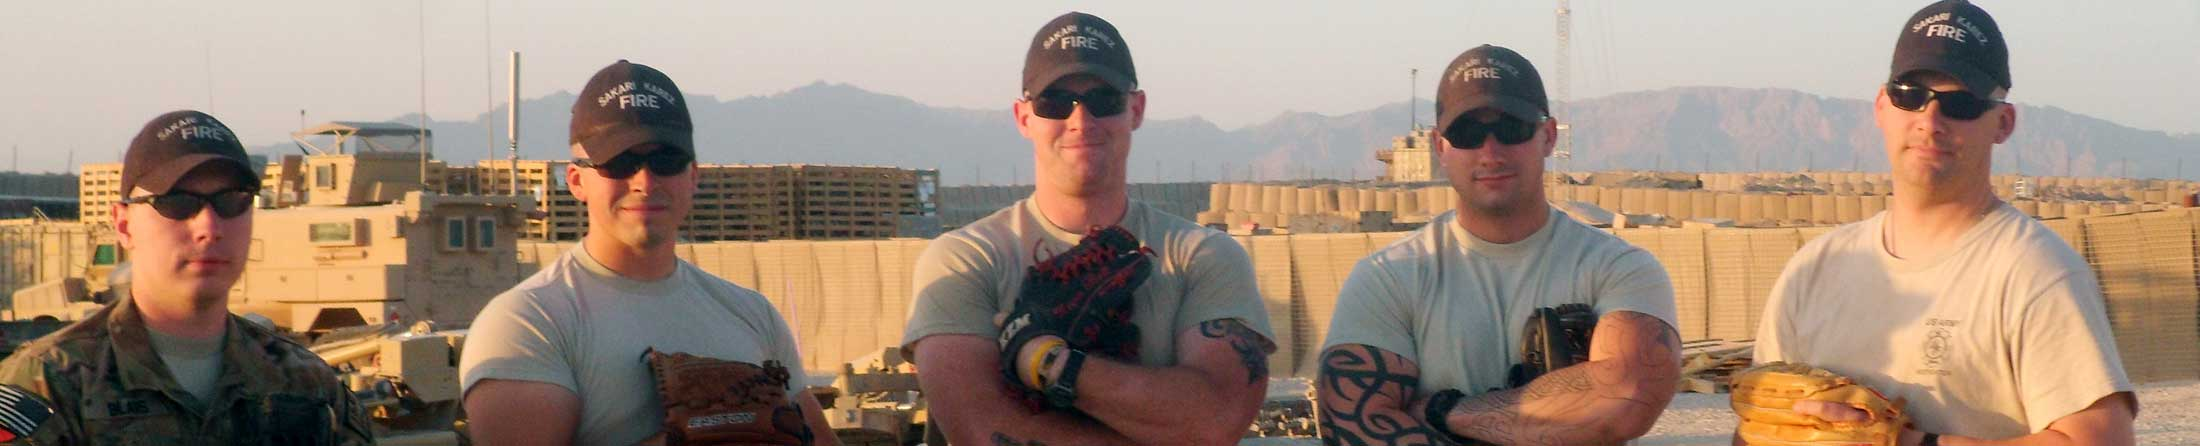 U.S. Army Baseball Players - header